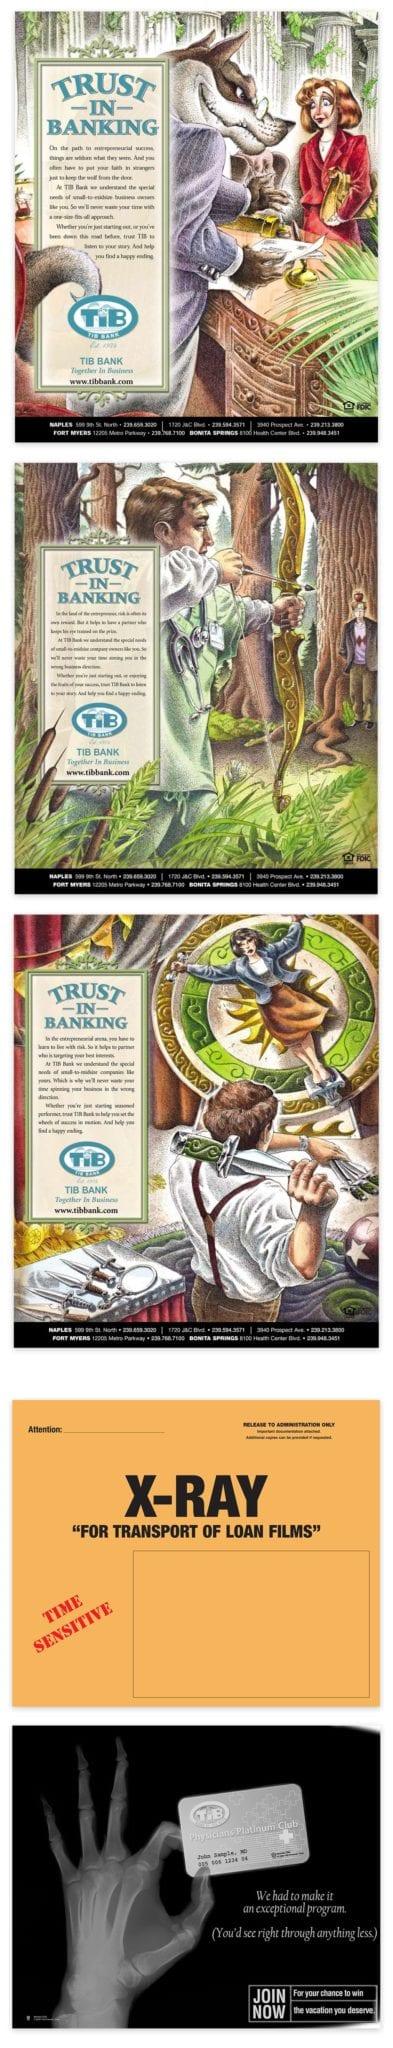 tib-bank_art_mashup